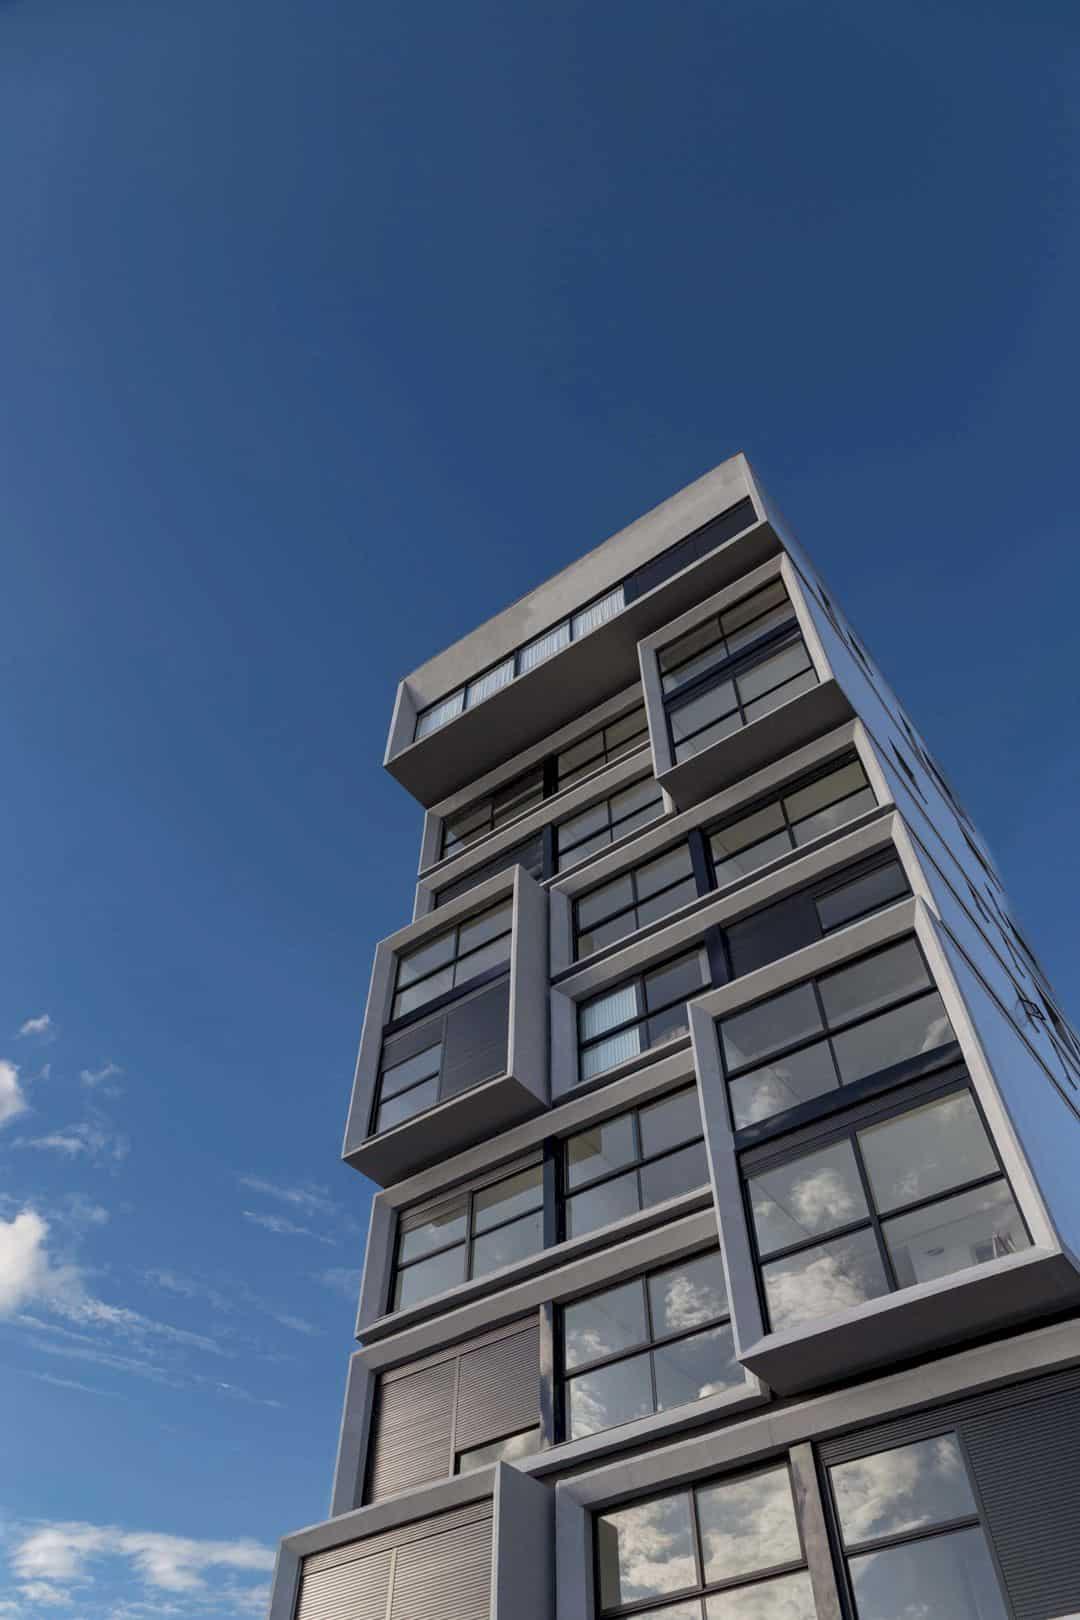 Fernando Abbott 866 A High Rise Residential Building In Porto Alegre 3